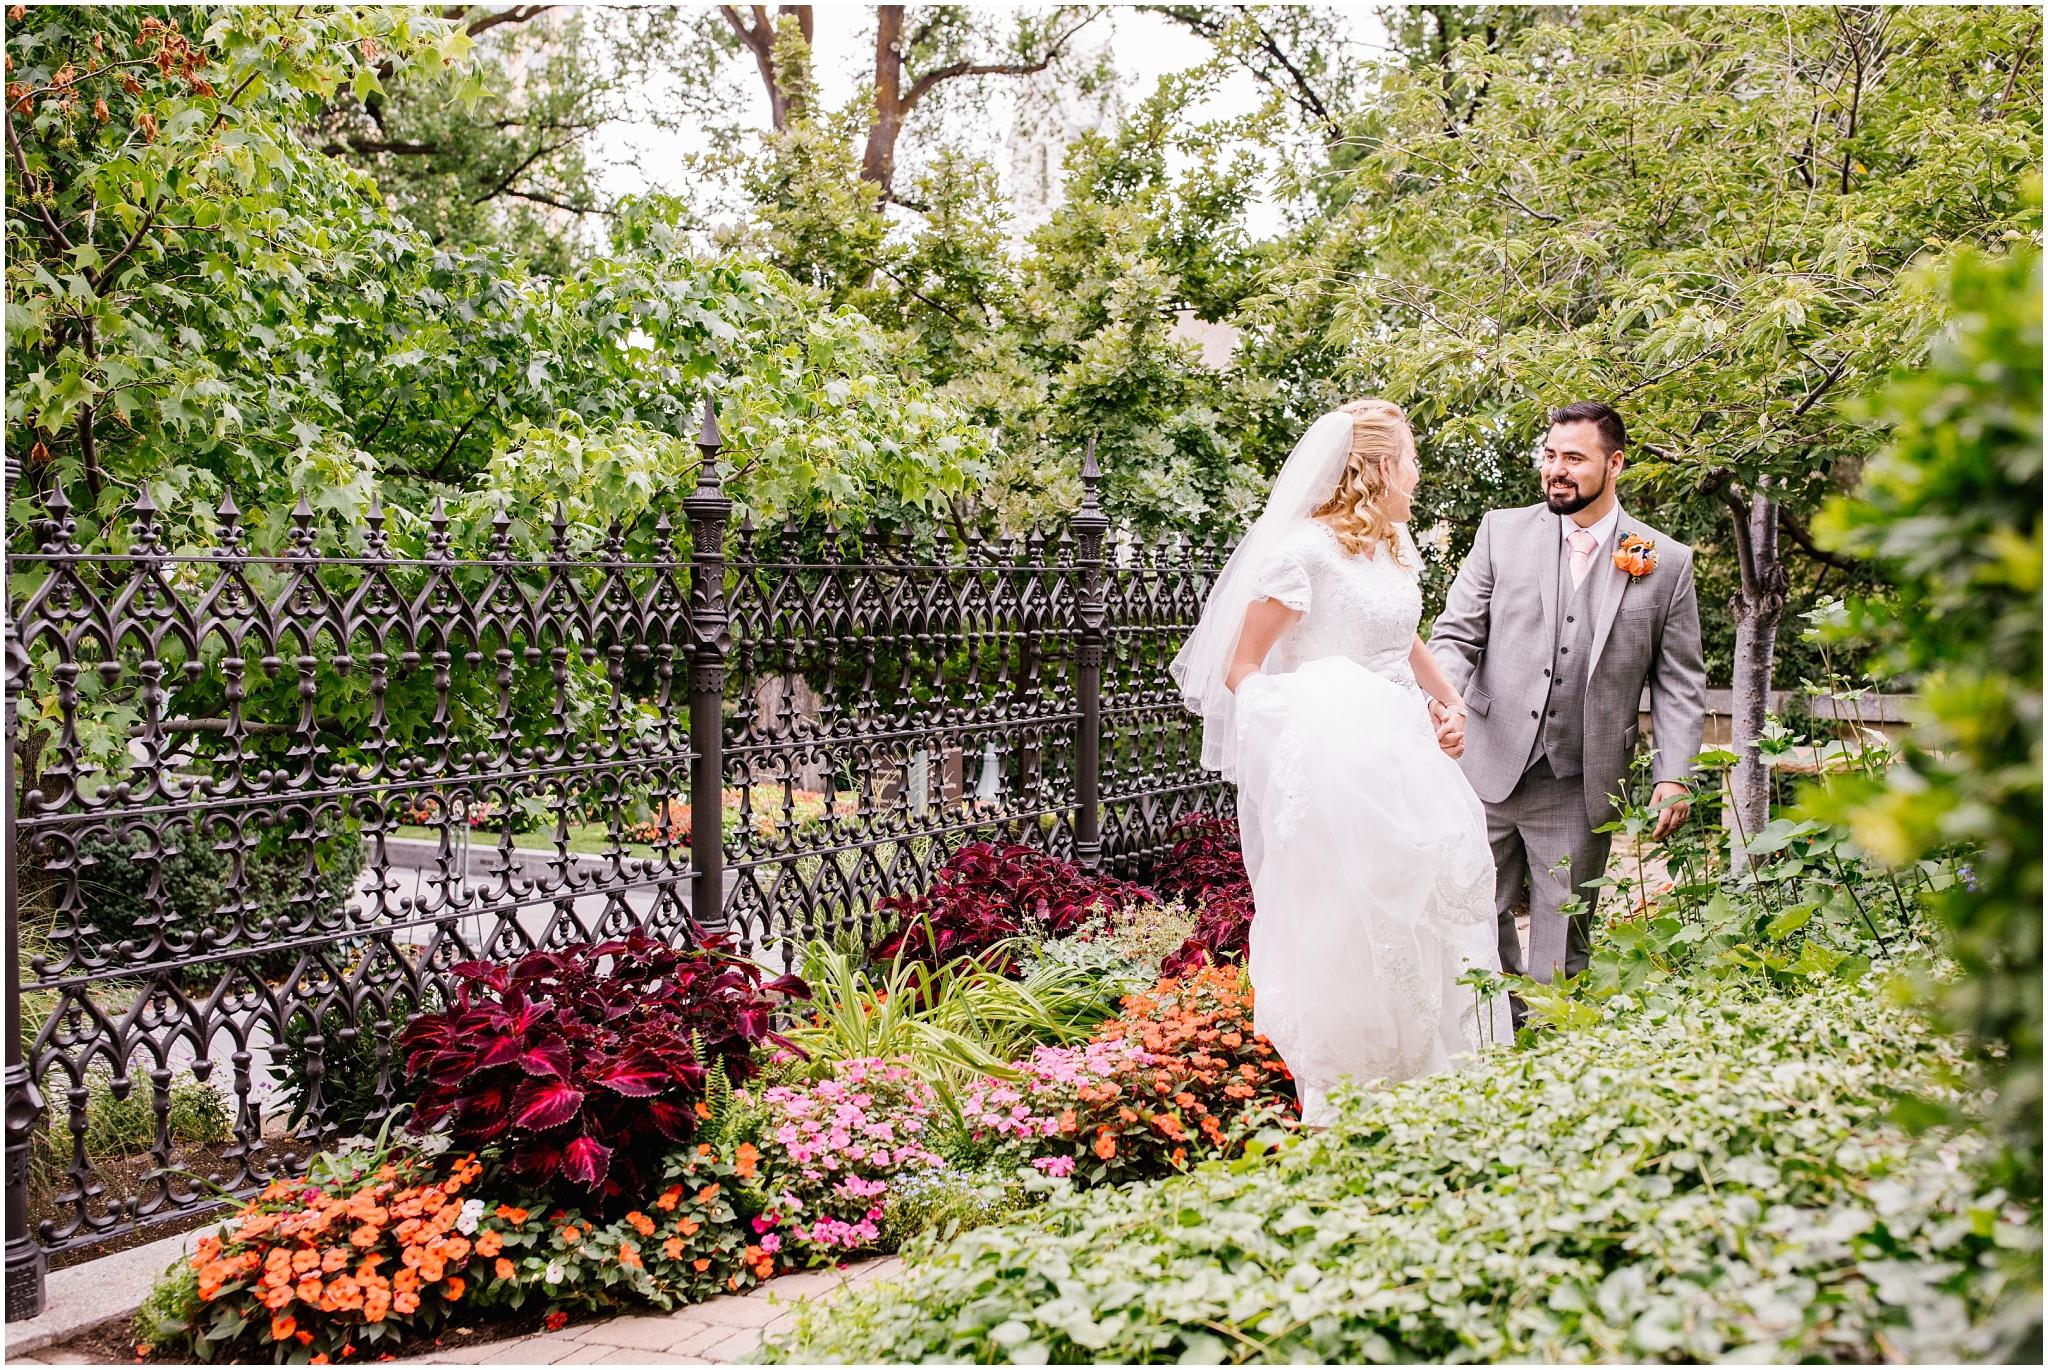 Justin and Melissa-150_Lizzie-B-Imagery-Utah-Wedding-Photographer-Salt-Lake-City-Temple-The-Grand-Ballroom.jpg